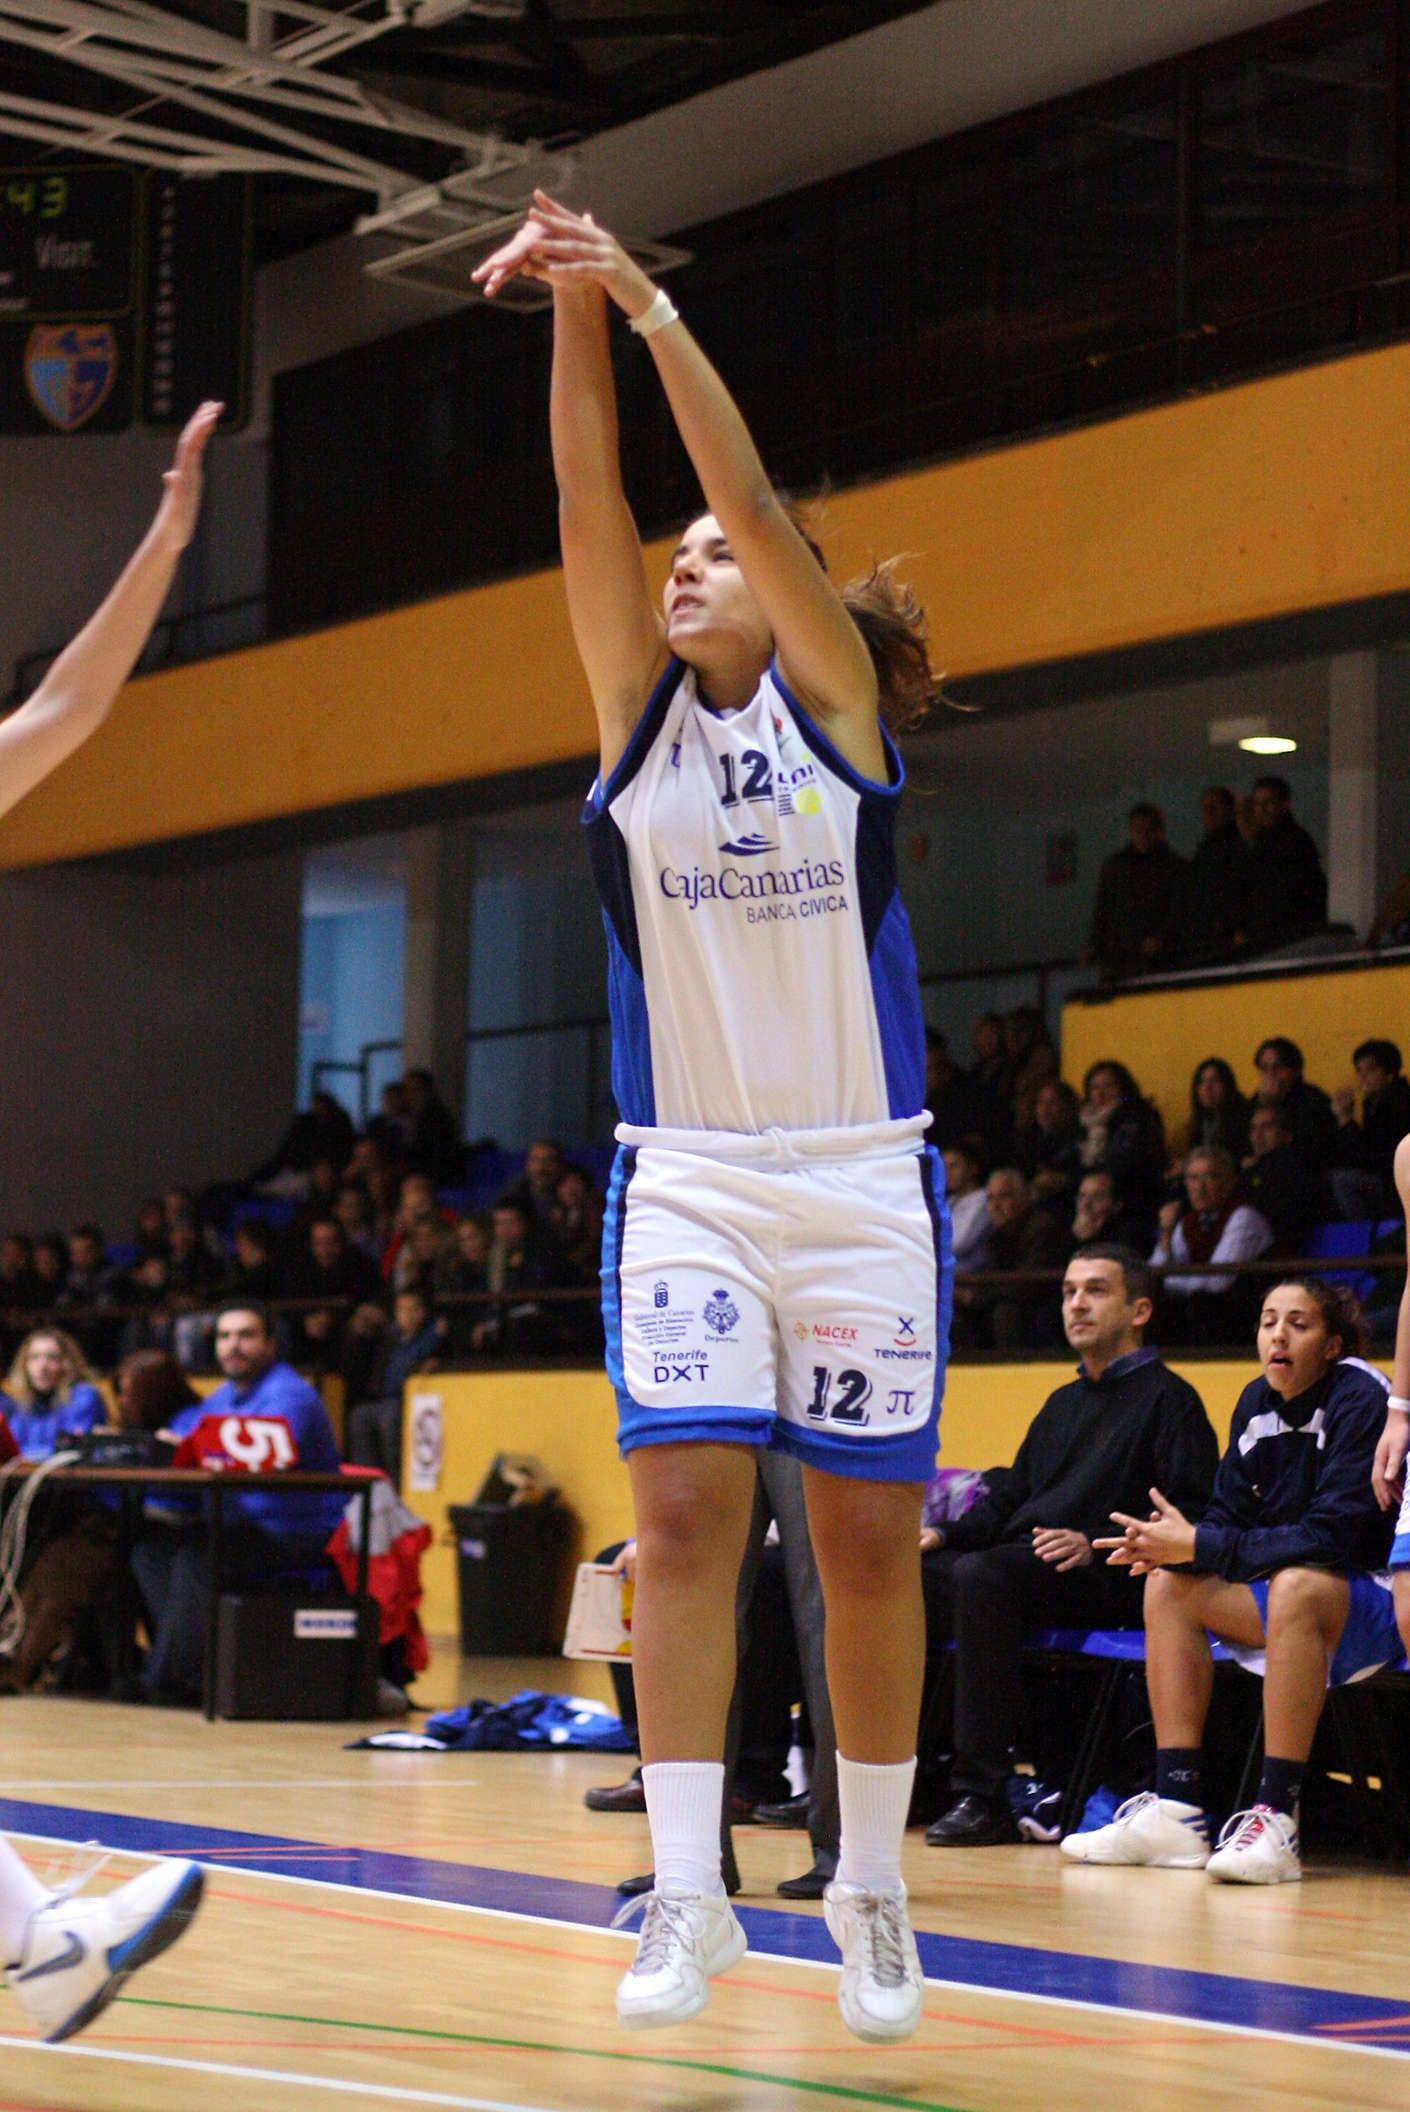 LF2: Teresa González nueva jugadora del Asefa Estudiantes